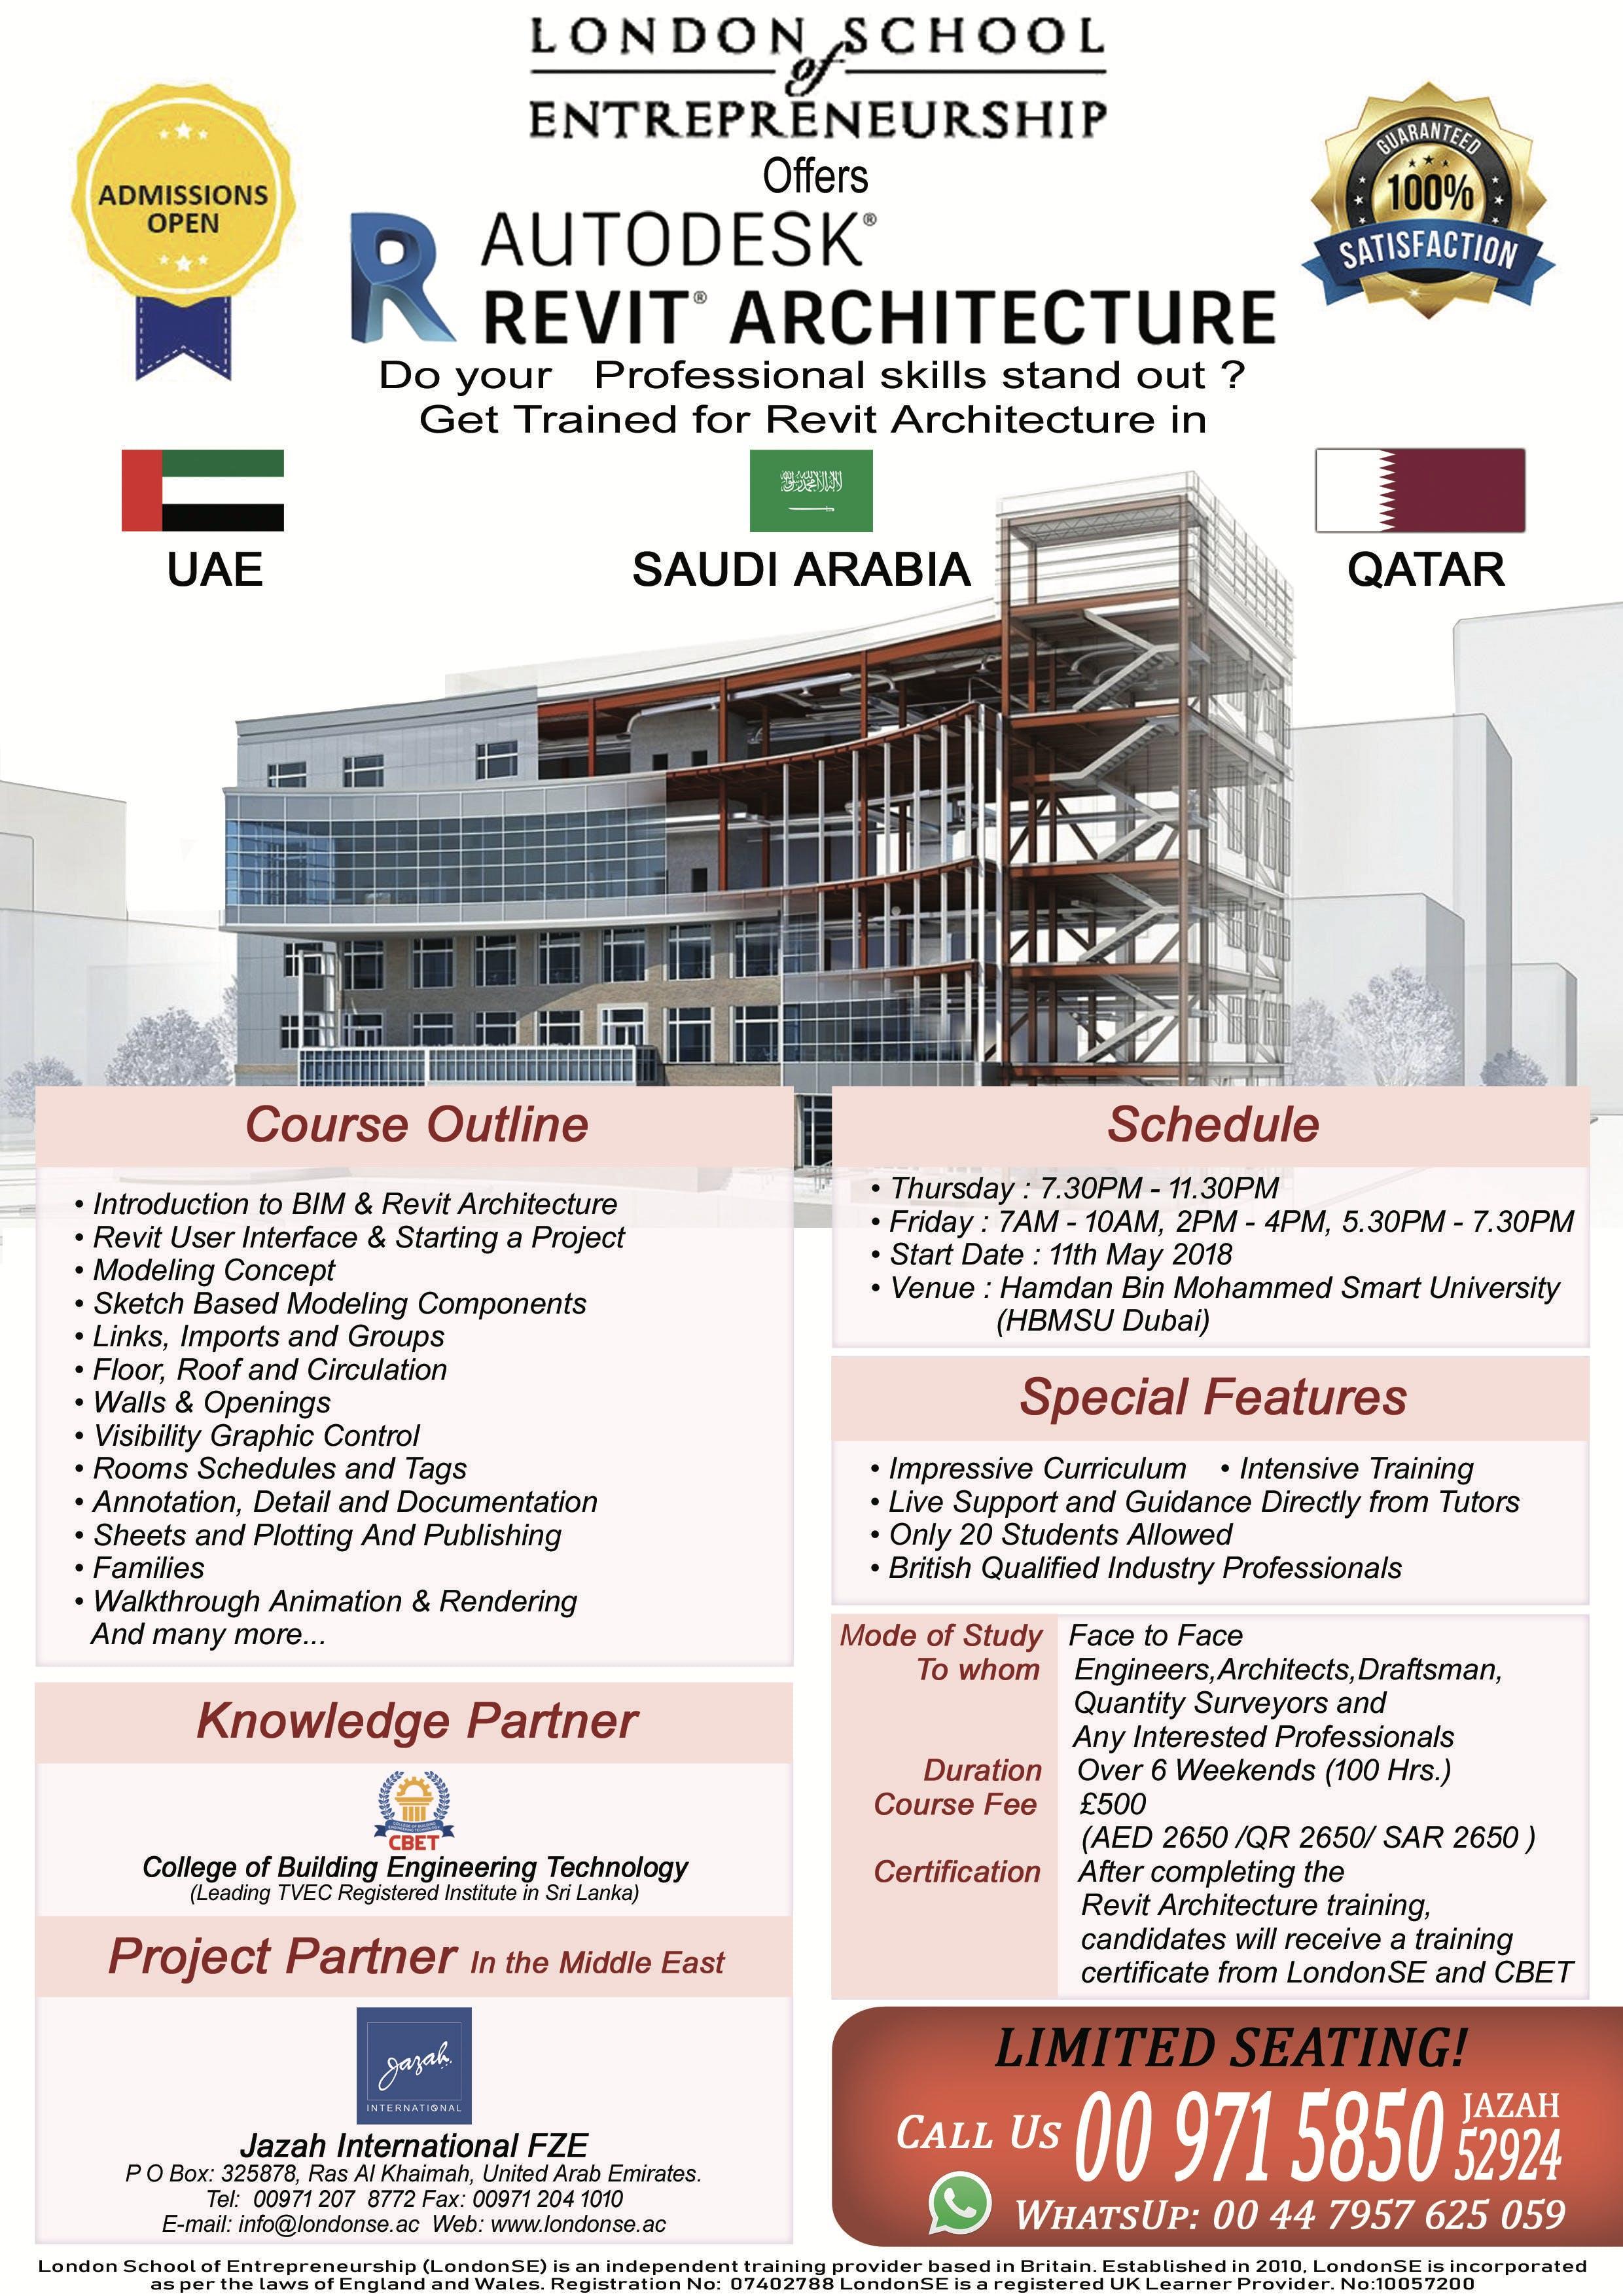 revit architecture training in dubai 11 may 2018